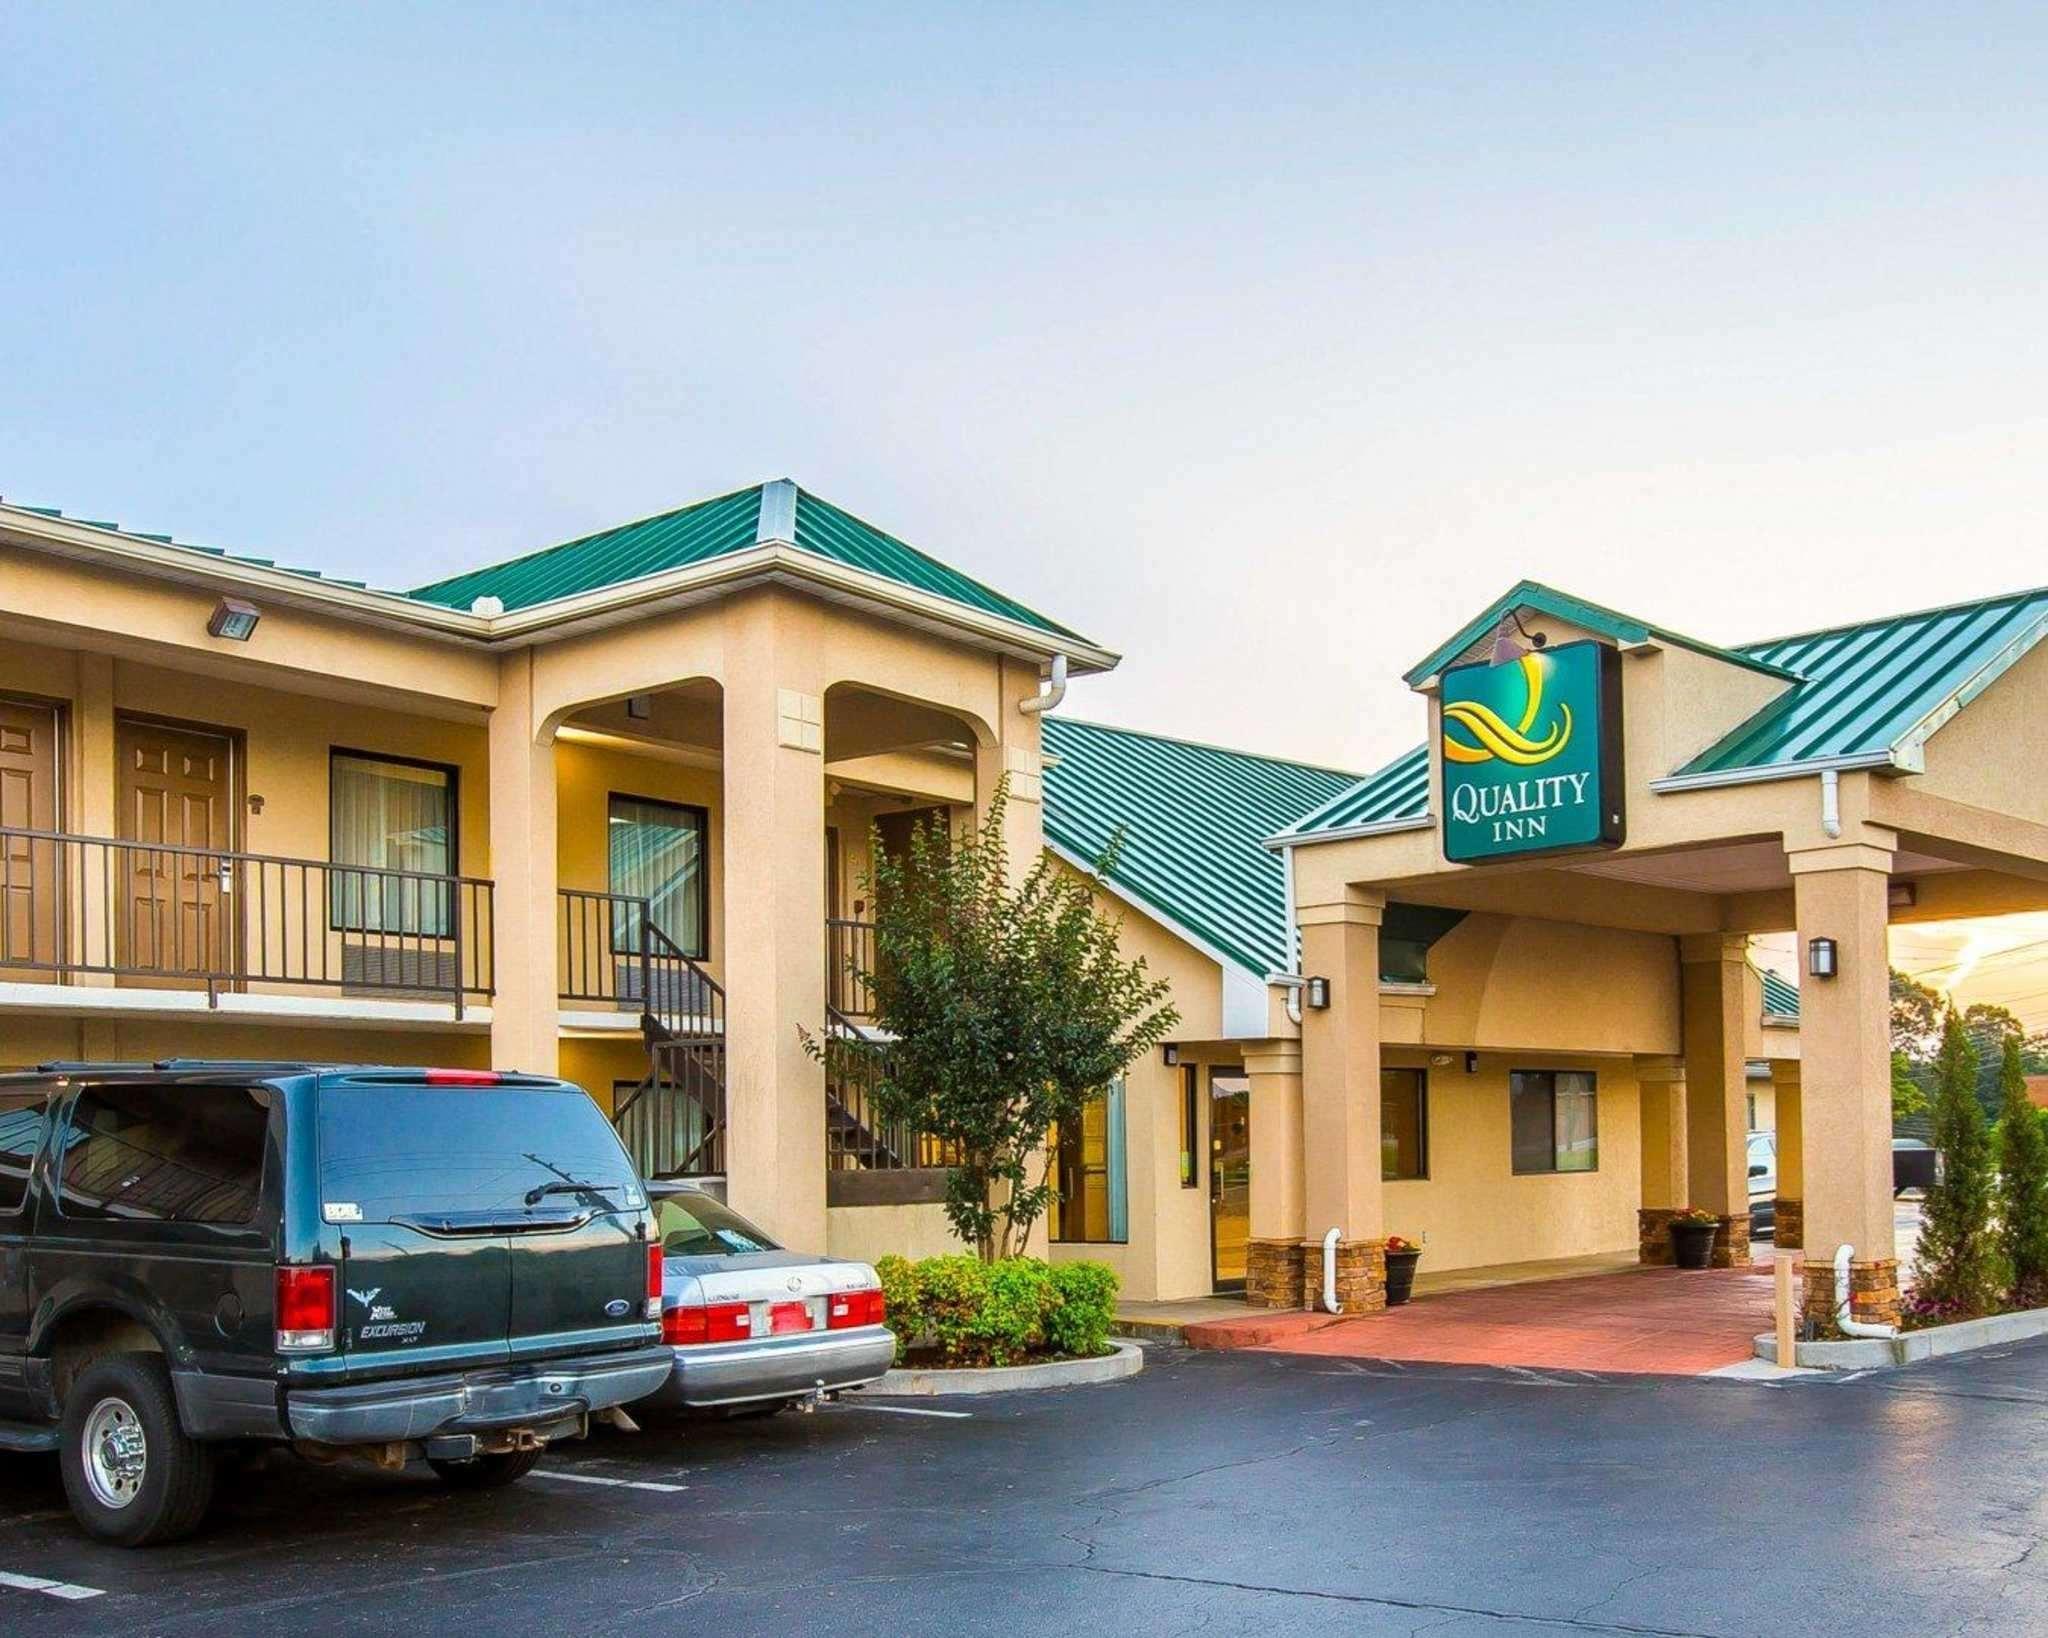 Quality Inn hotel in Dahlonega GA